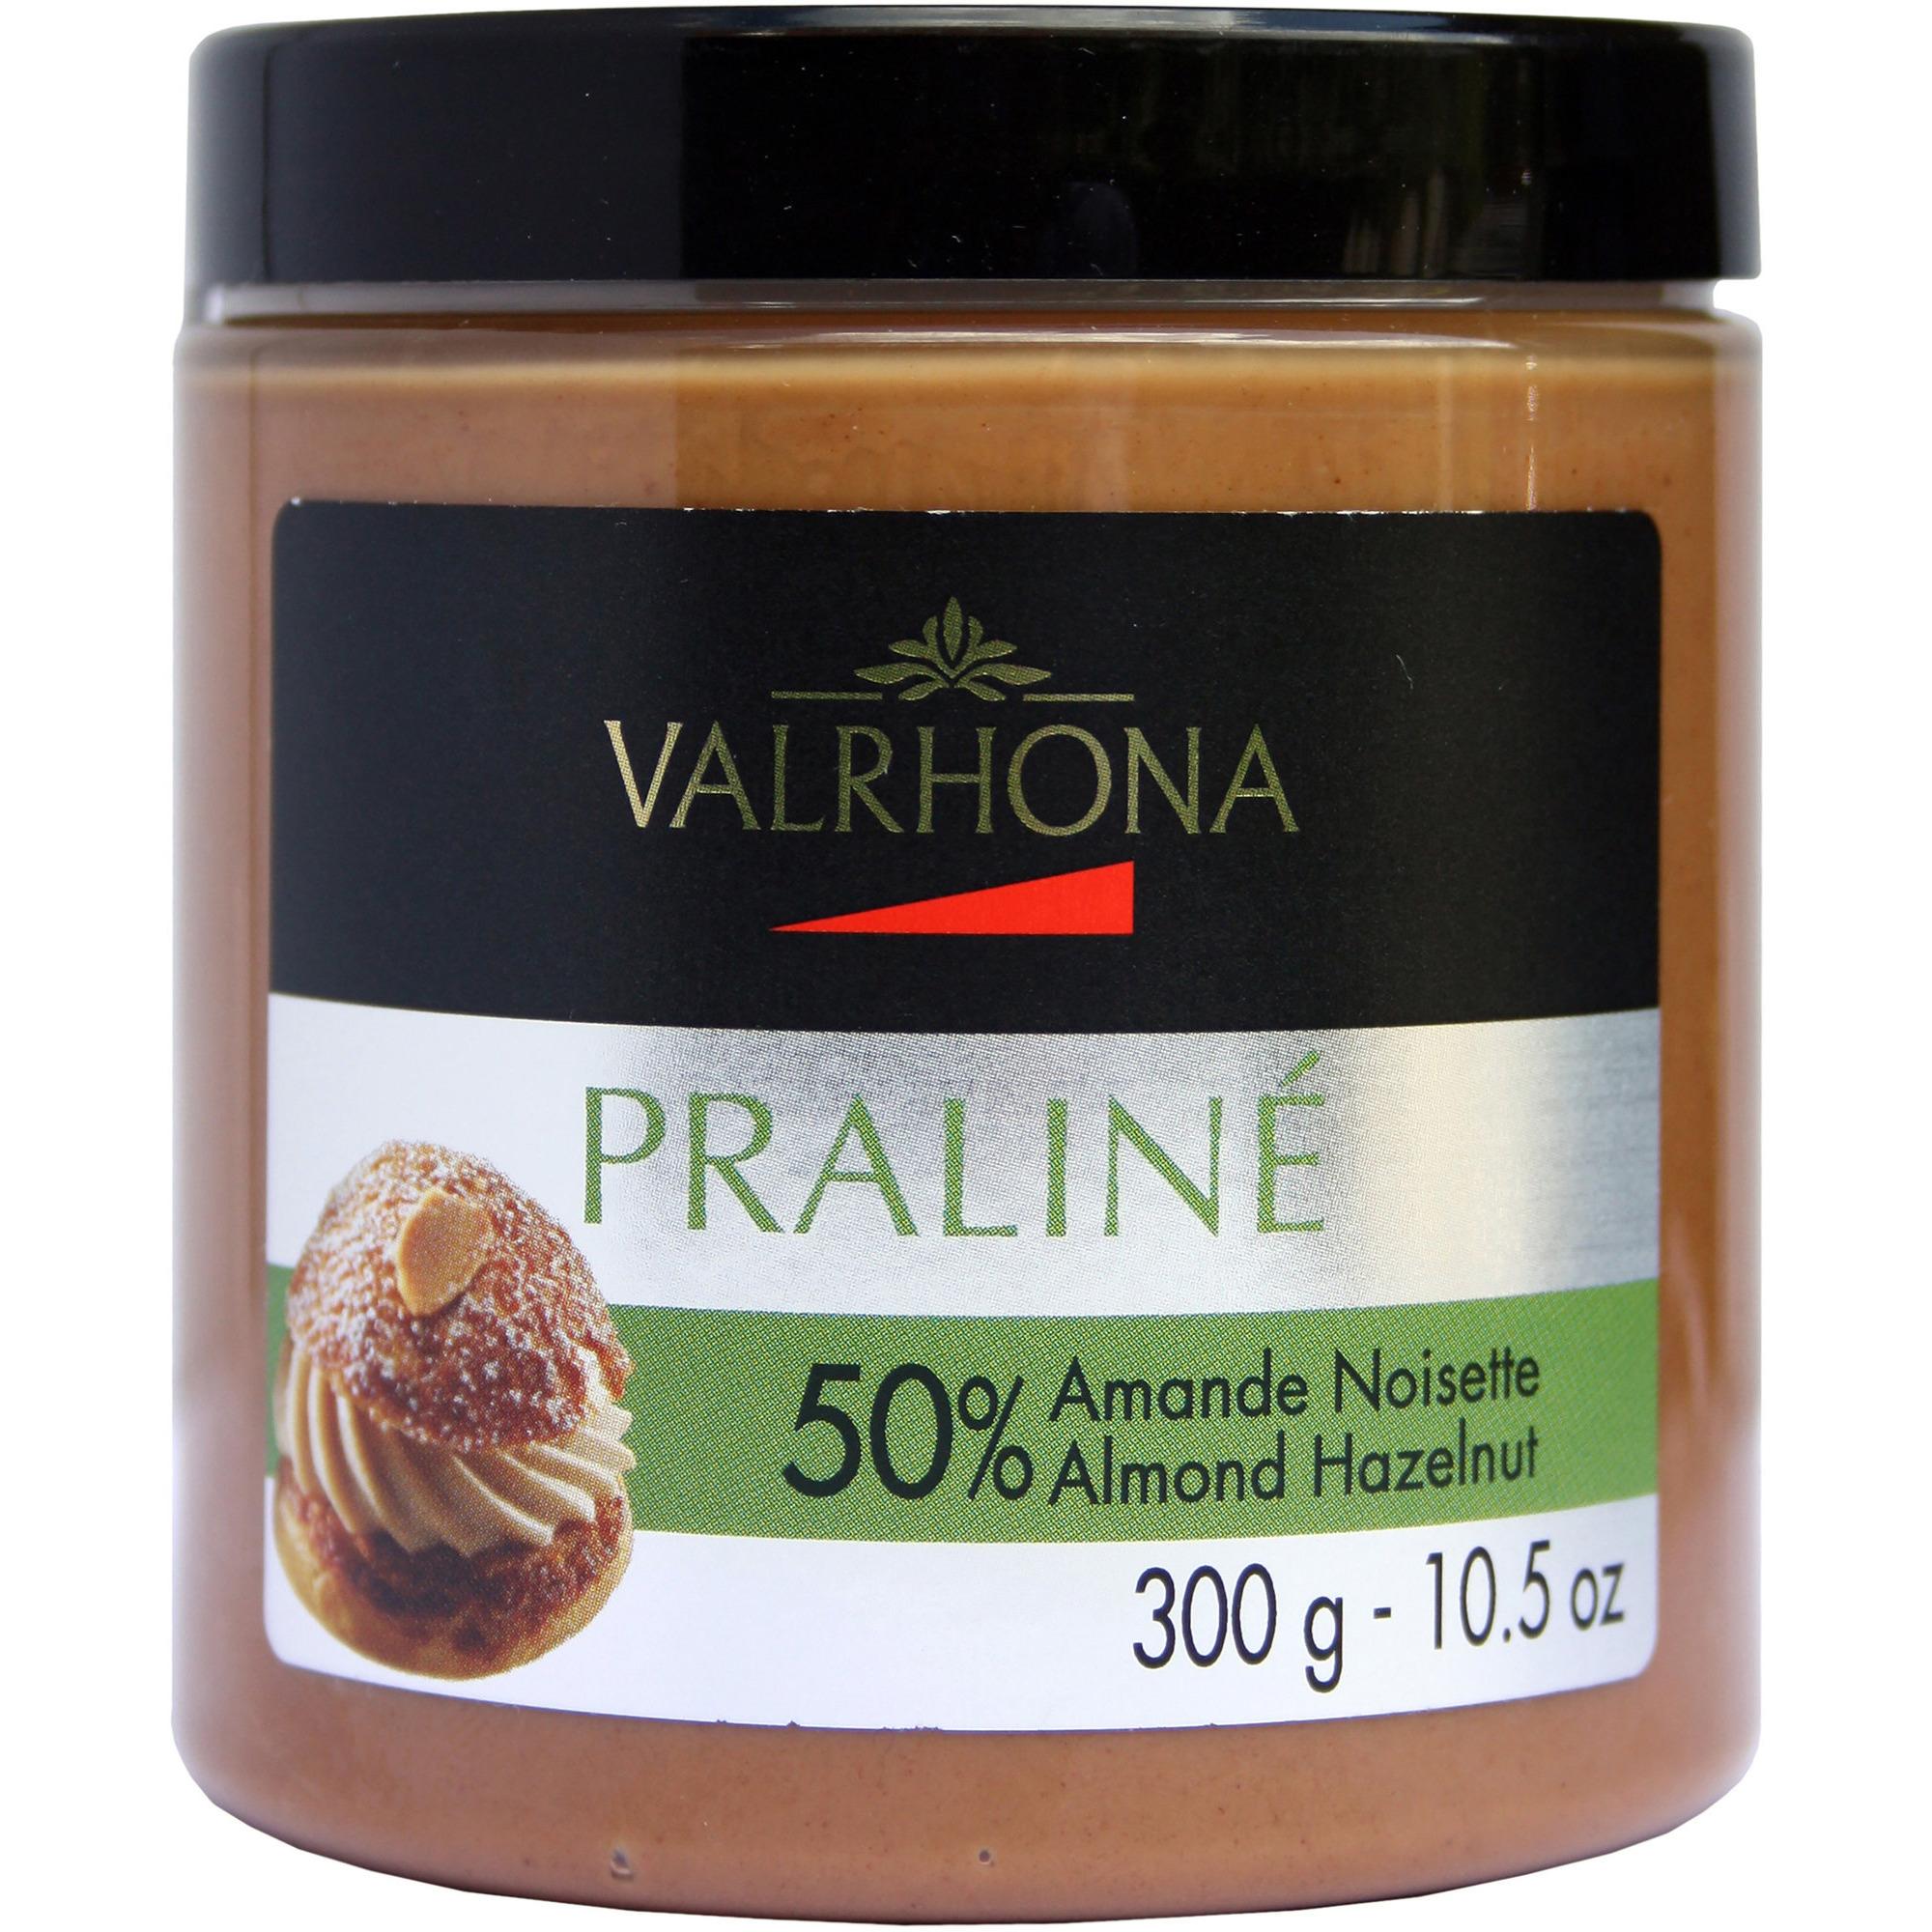 Valrhona Praliné Hasselnötspraliné 300g